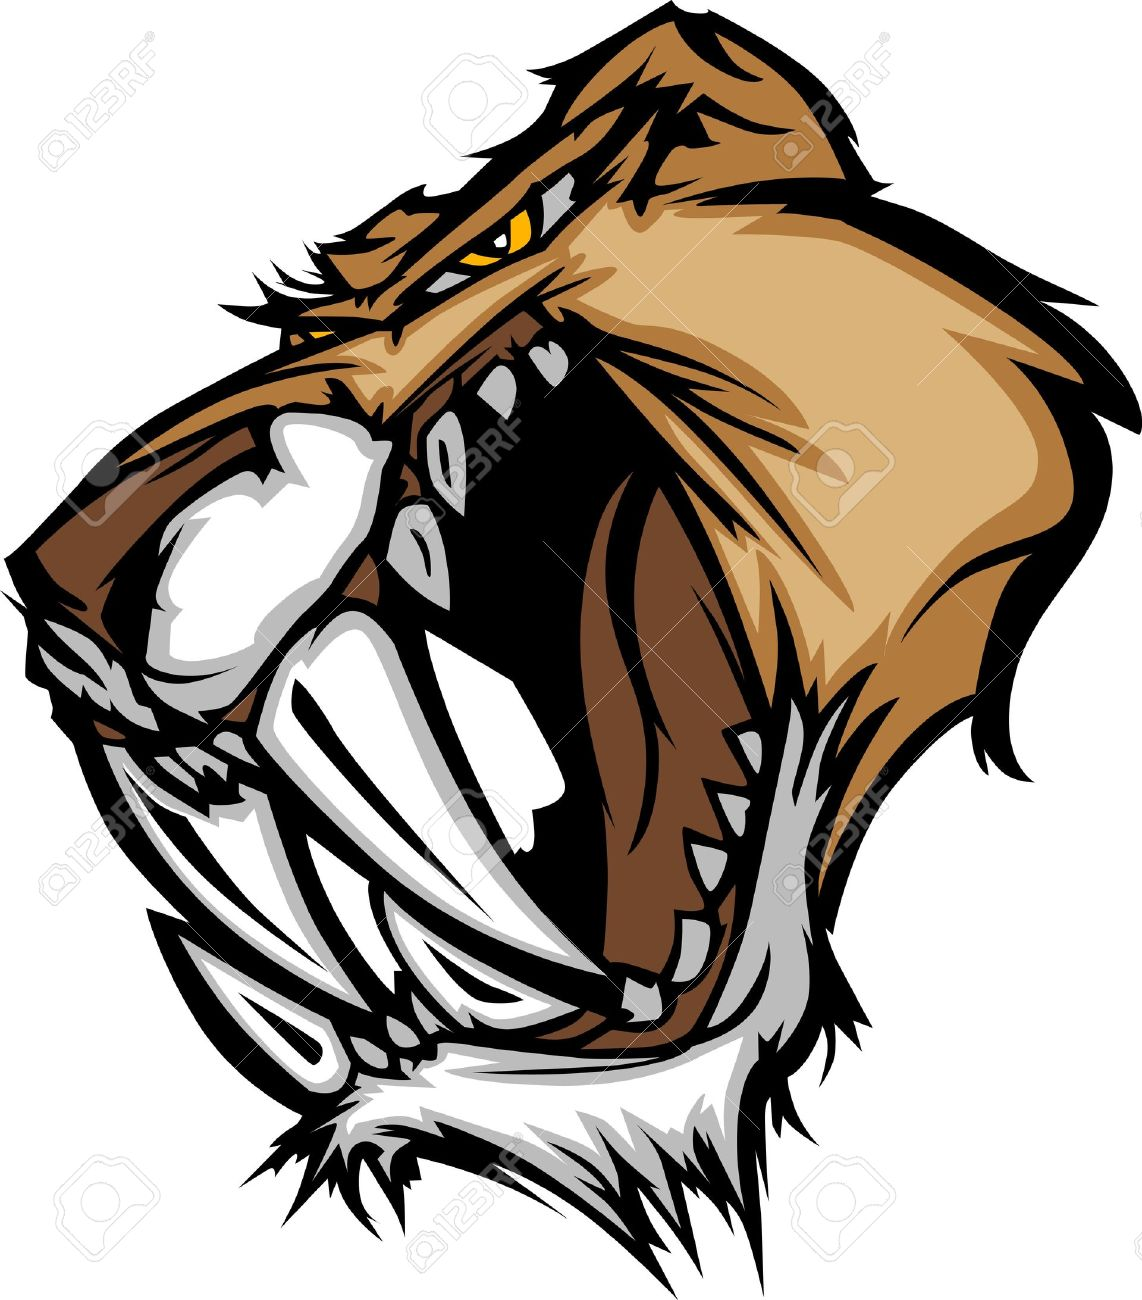 graphic vector mascot image of a saber cat cougar head royalty free rh 123rf com cougar clip art templates cougar clipart for schools